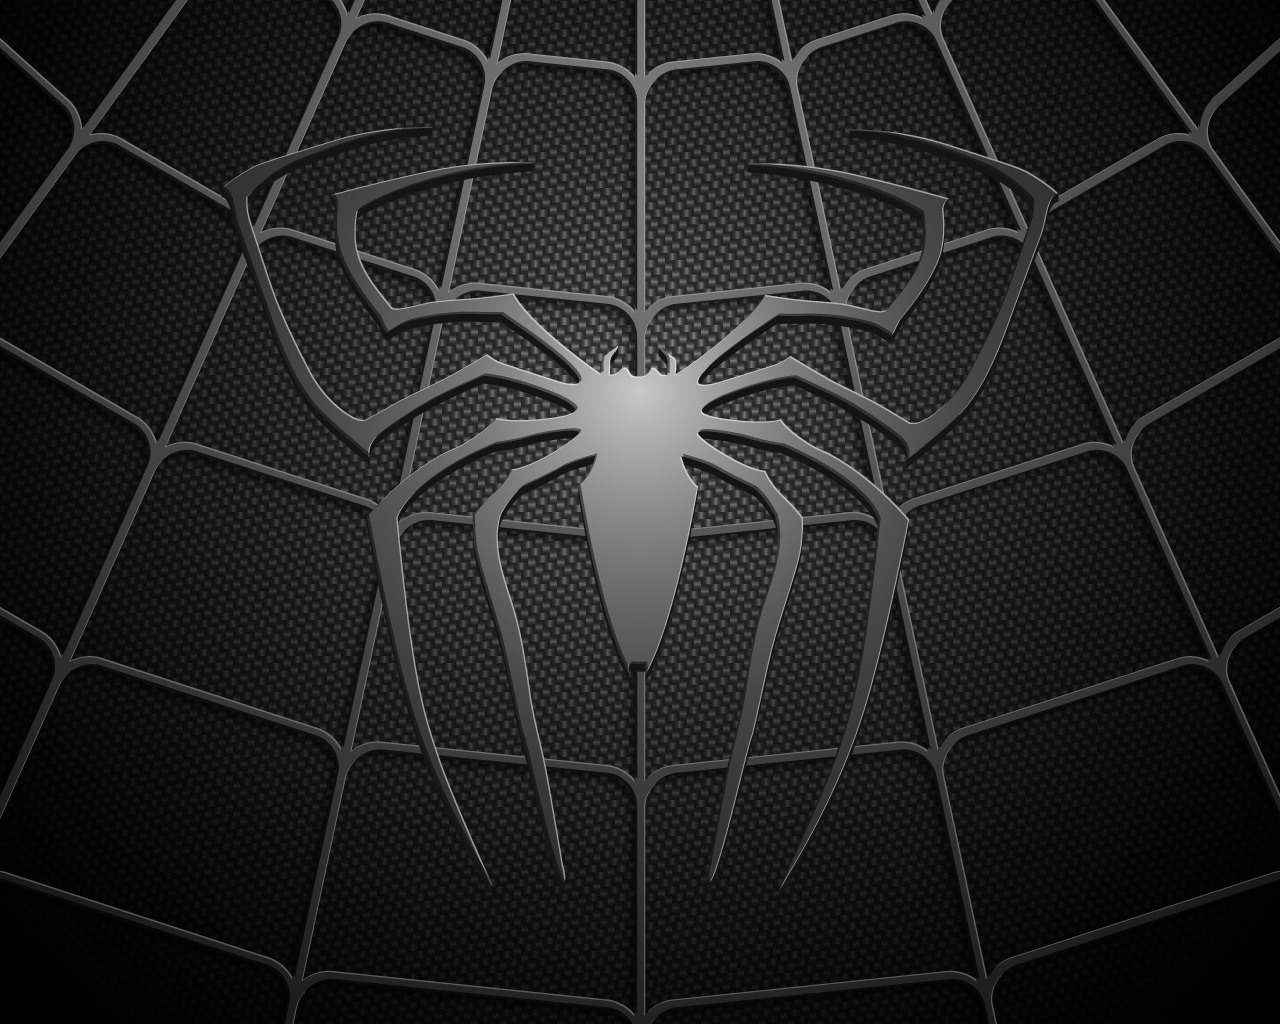 Free Download Spiderman Logo Hd Wallpaper Spiderman Logo